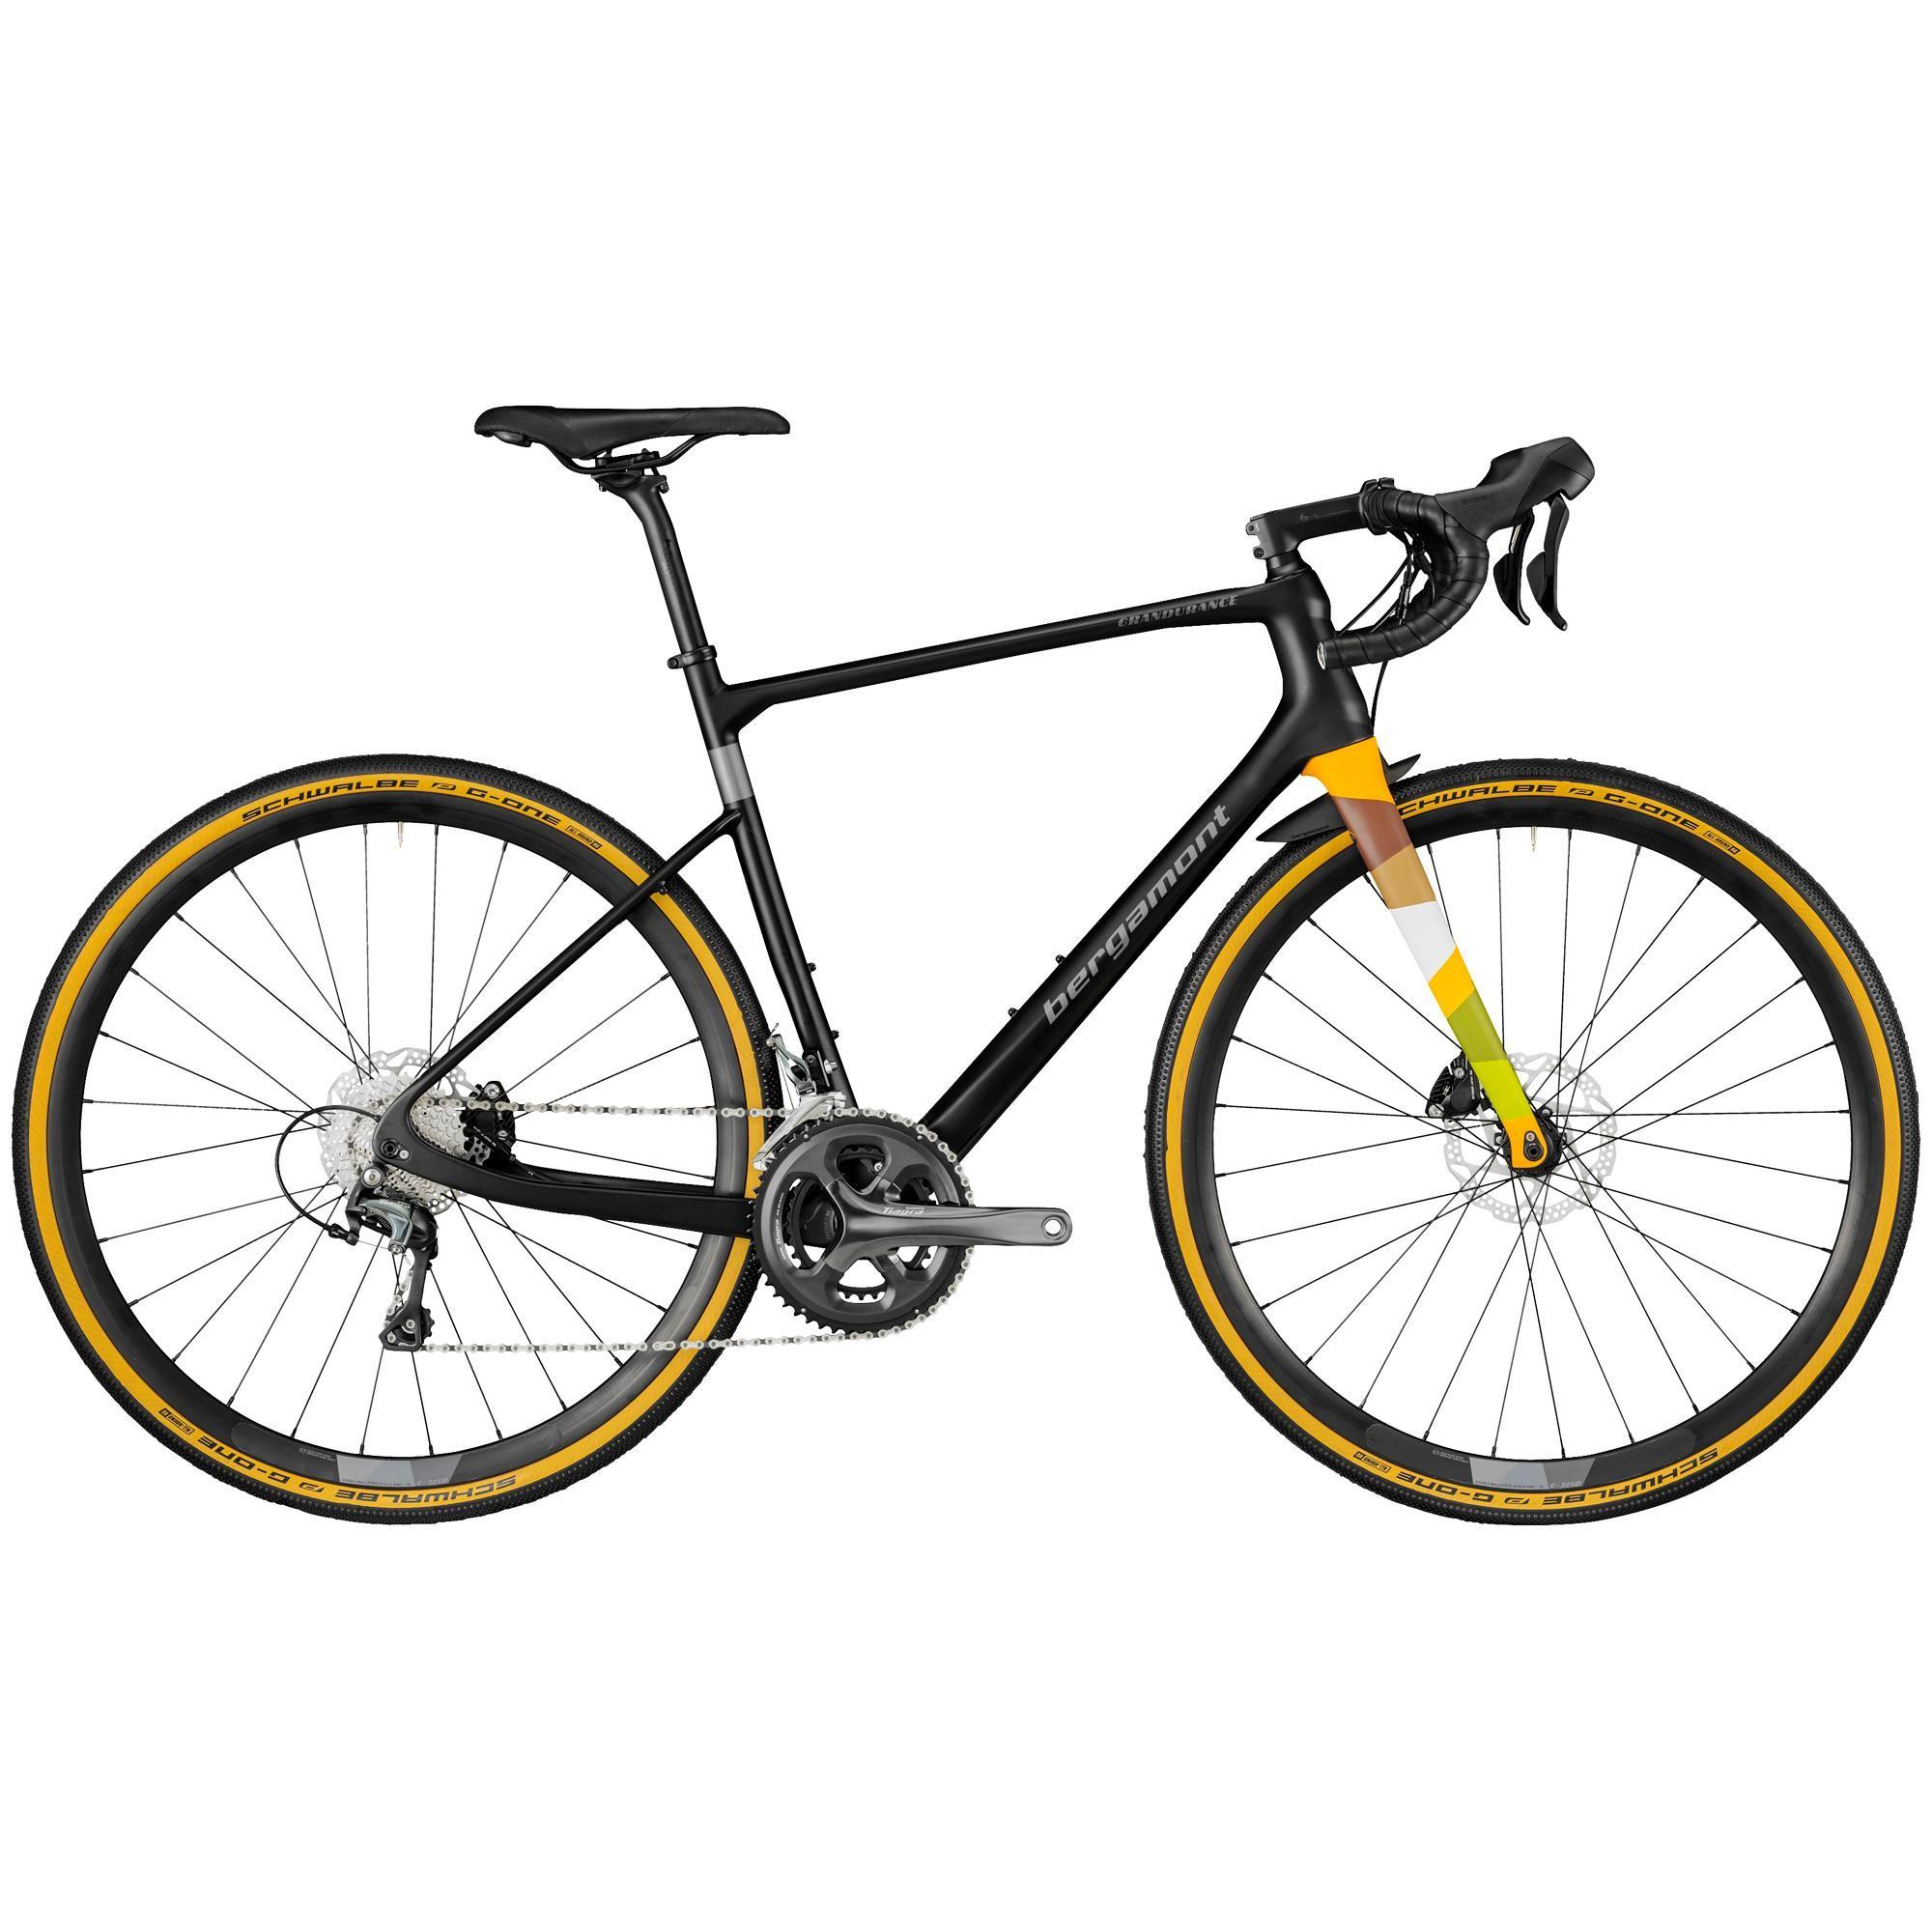 Bergamont Grandurance Expert, landeveis-/grussykkel herre XS/49